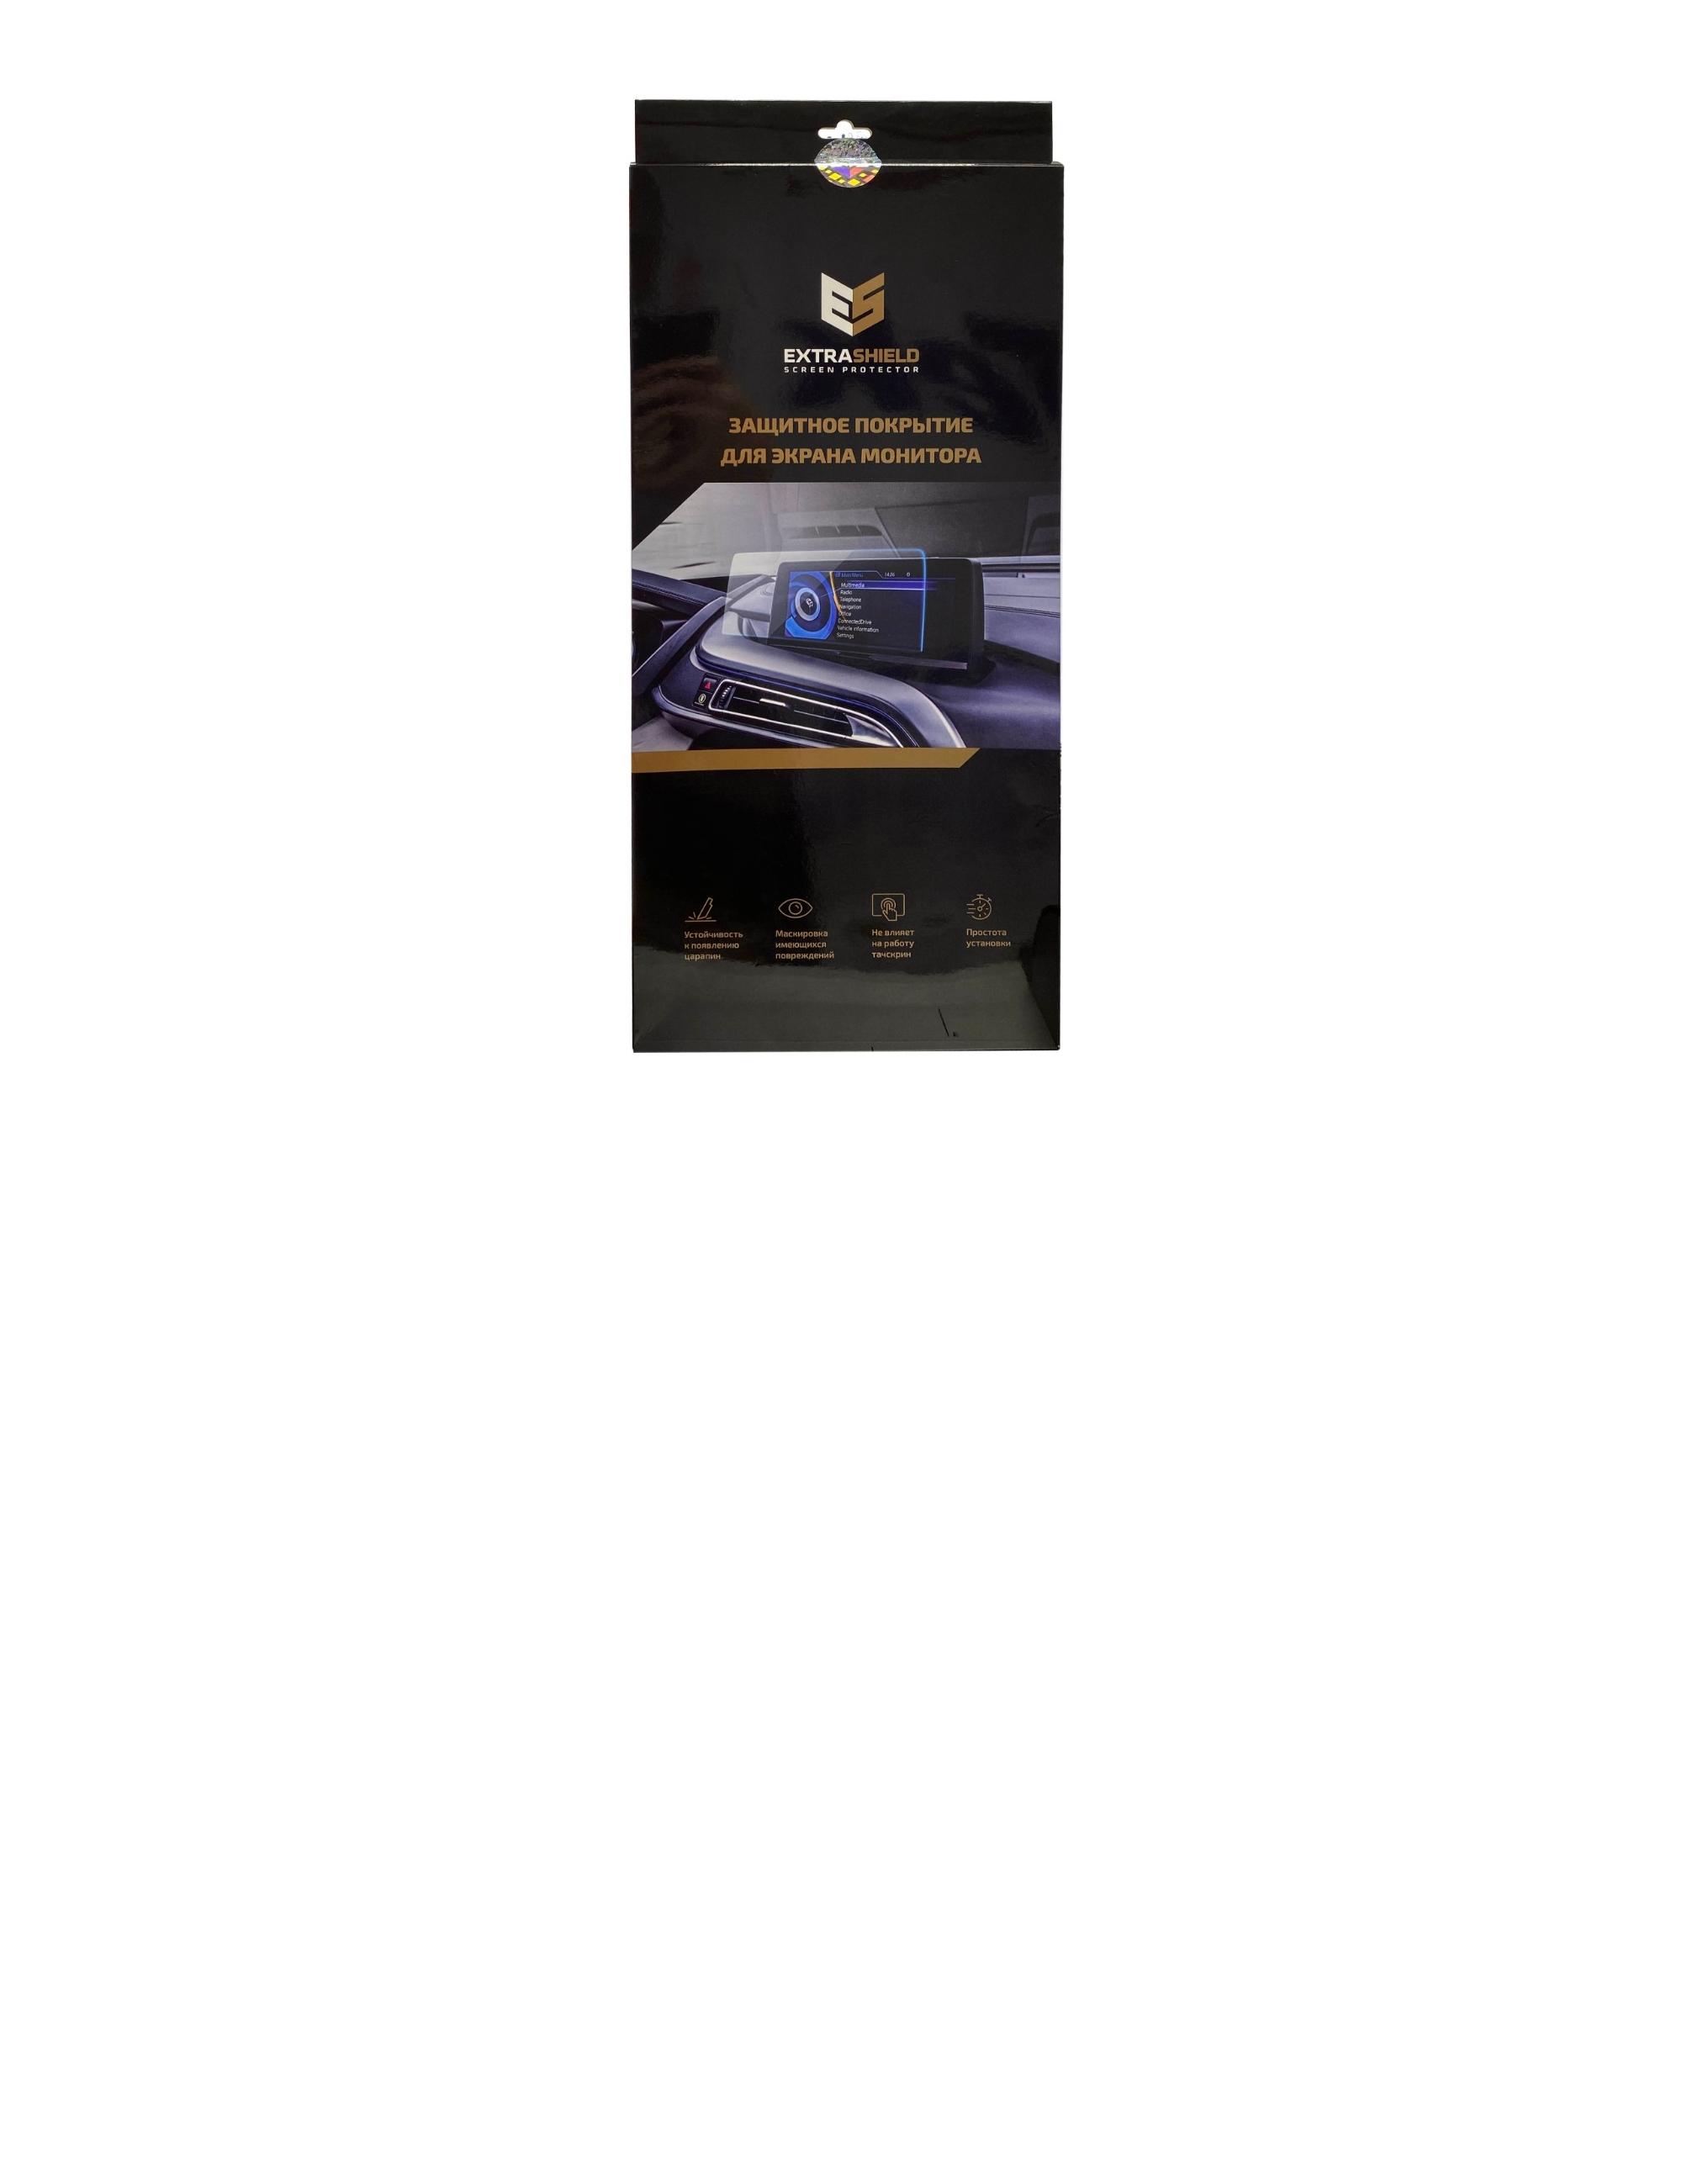 Audi Q7 II (4M) дорестайлинг 2016 - 2019 мультимедиа 8.3 Защитное стекло Глянец